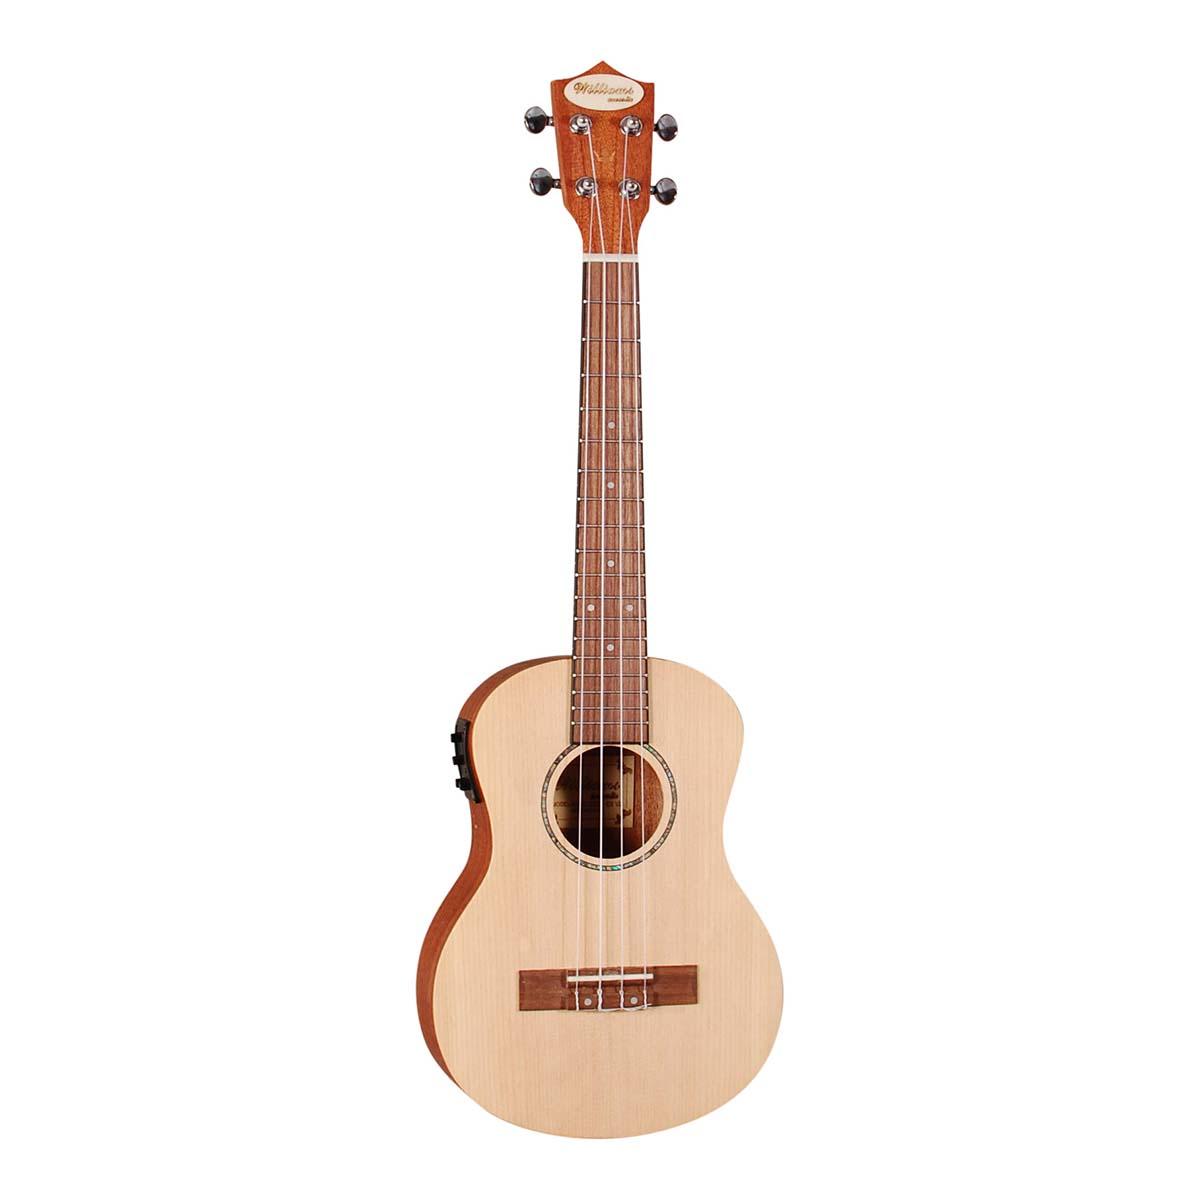 Williams Acoustic EU200T-EQ v2 tenor ukulele